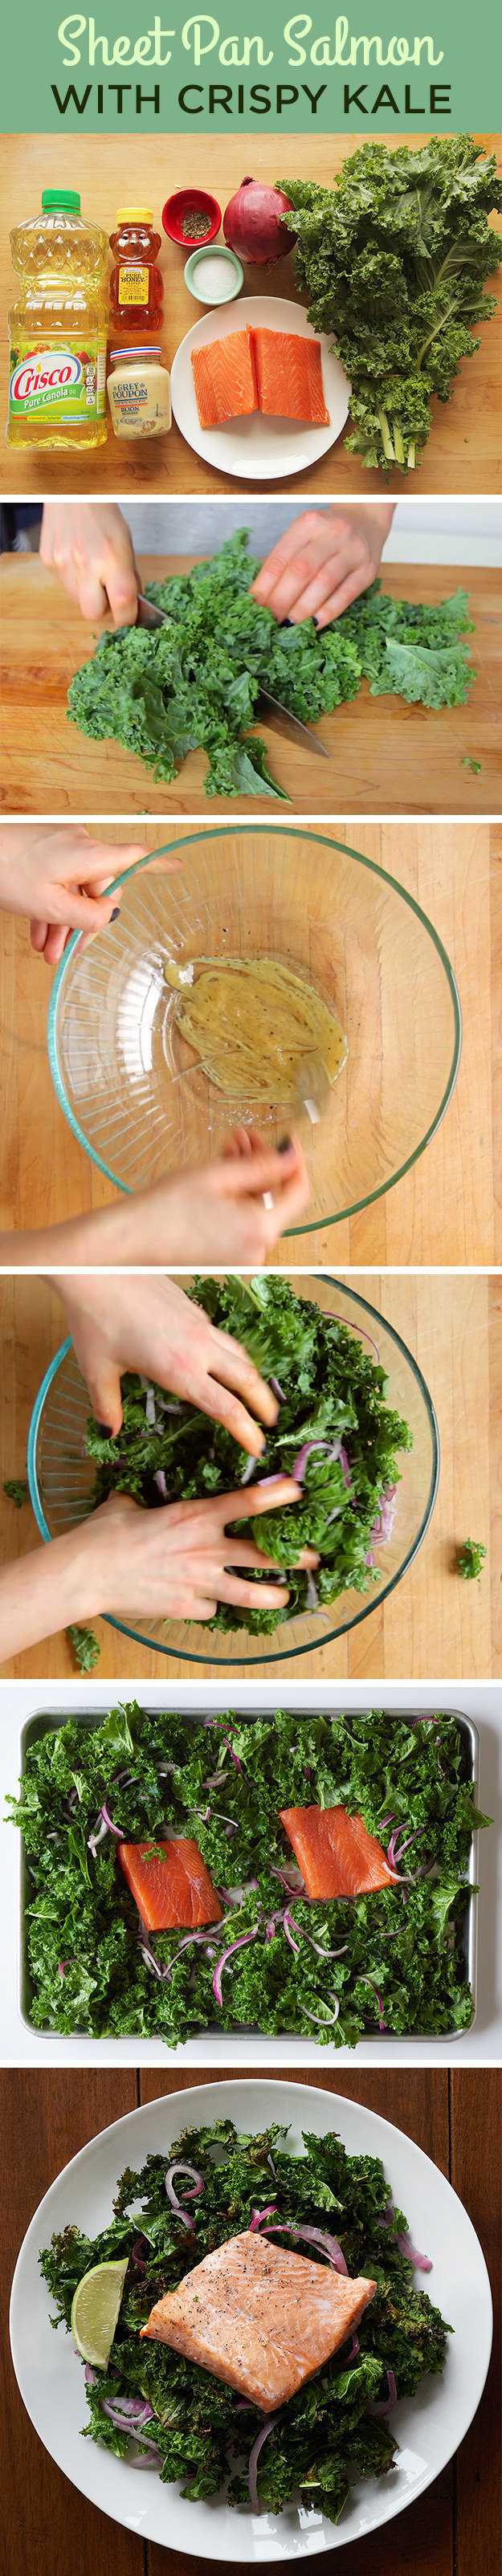 How To Make Sheet Pan Salmon With Crispy Kale